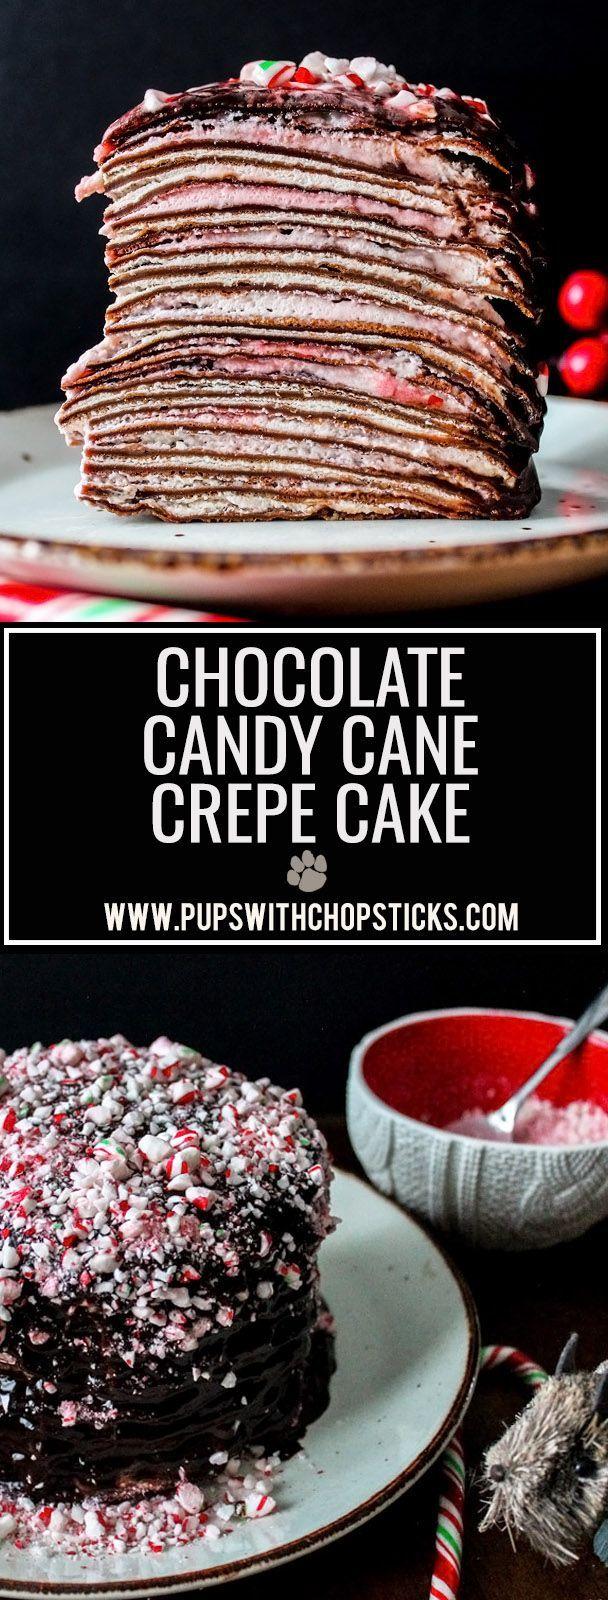 Chocolate Candy Cane Crepe Cake